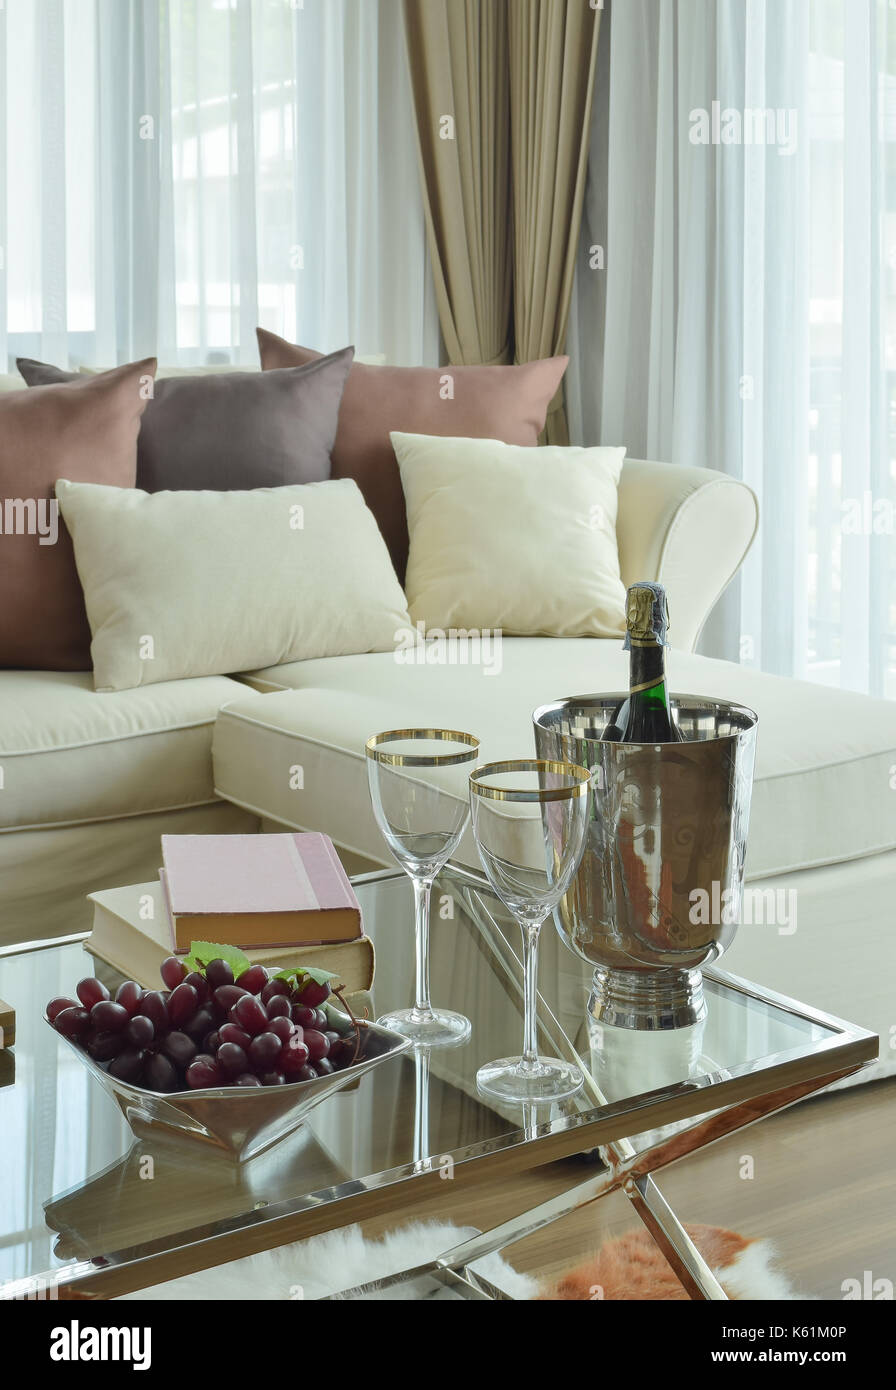 room sofa stripes table stockfotos room sofa stripes table bilder alamy. Black Bedroom Furniture Sets. Home Design Ideas